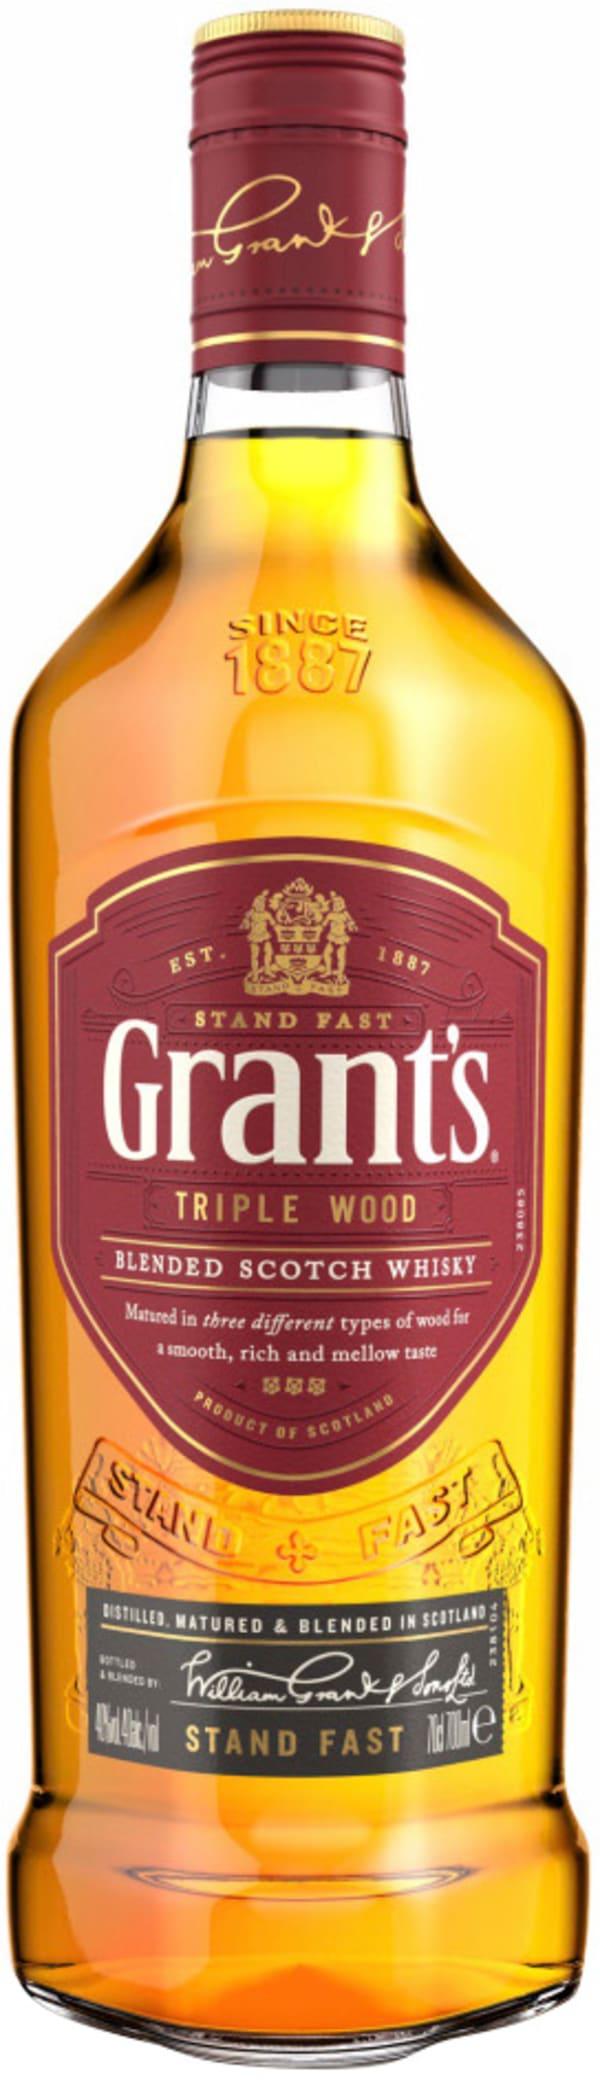 Grant`s Triple Wood